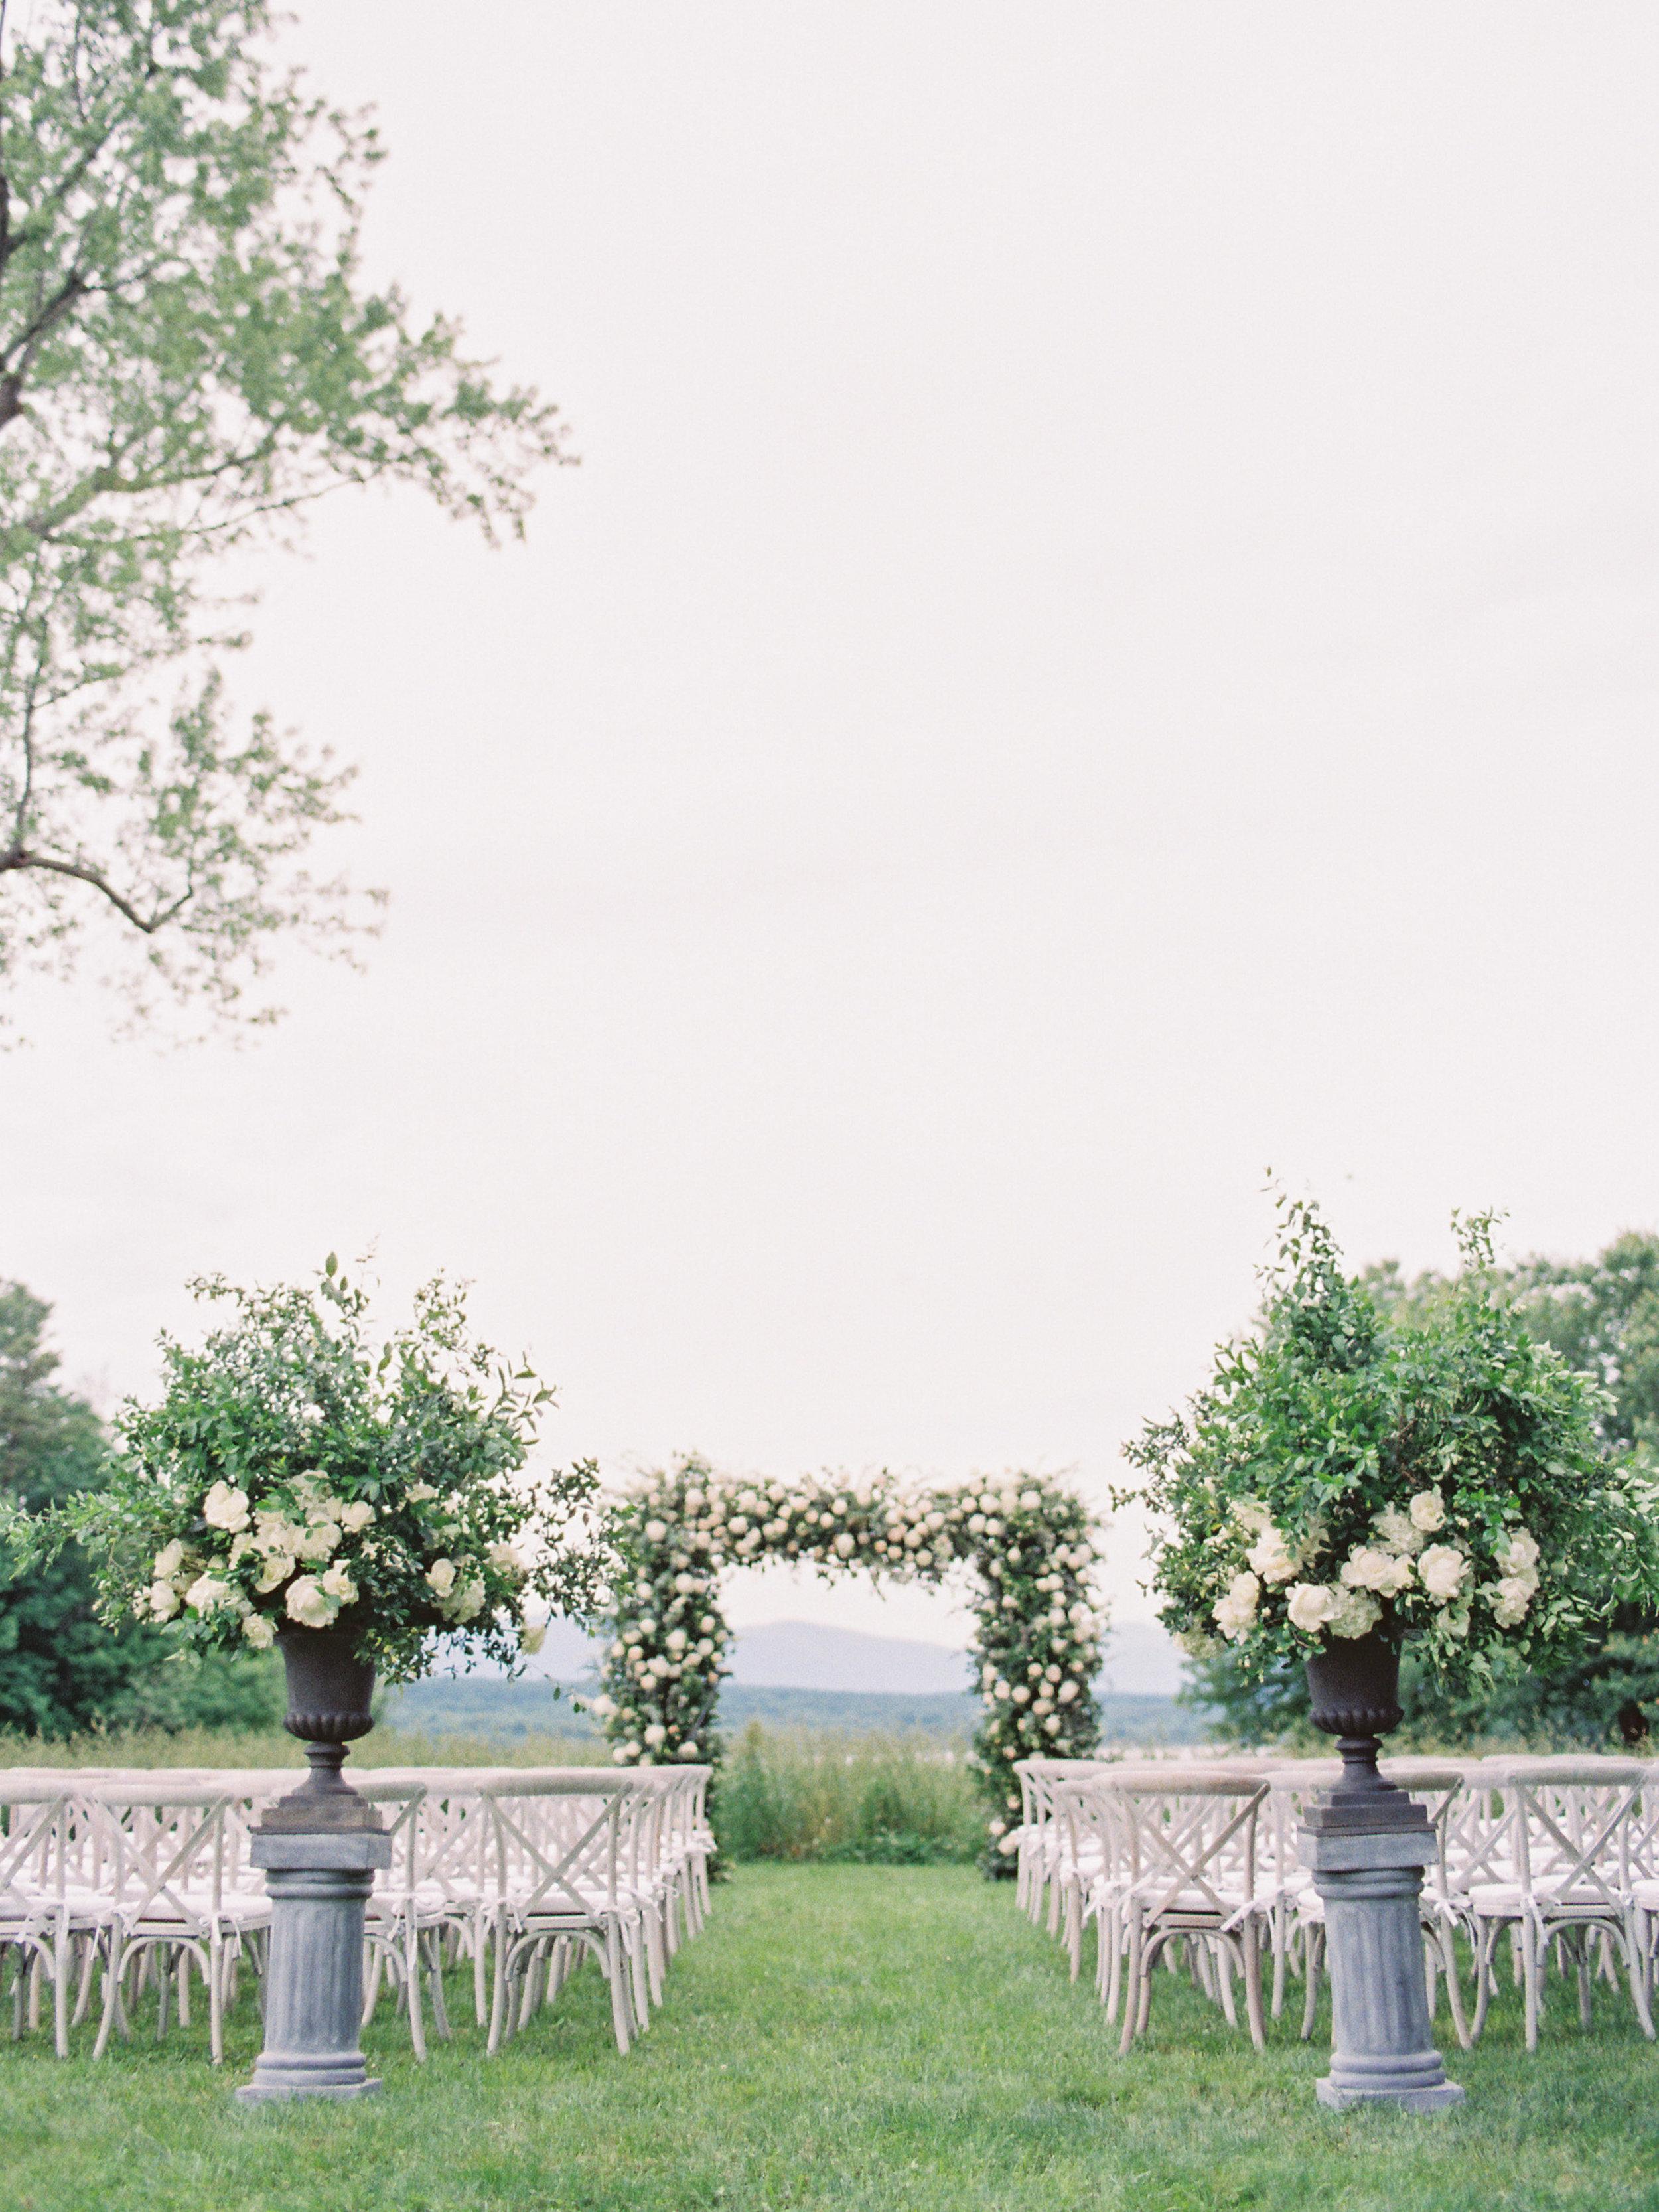 Ankony_Farm_Wedding-77-Jen-Huang-AS-4-Jen-Huang-003130-R1-004.jpg